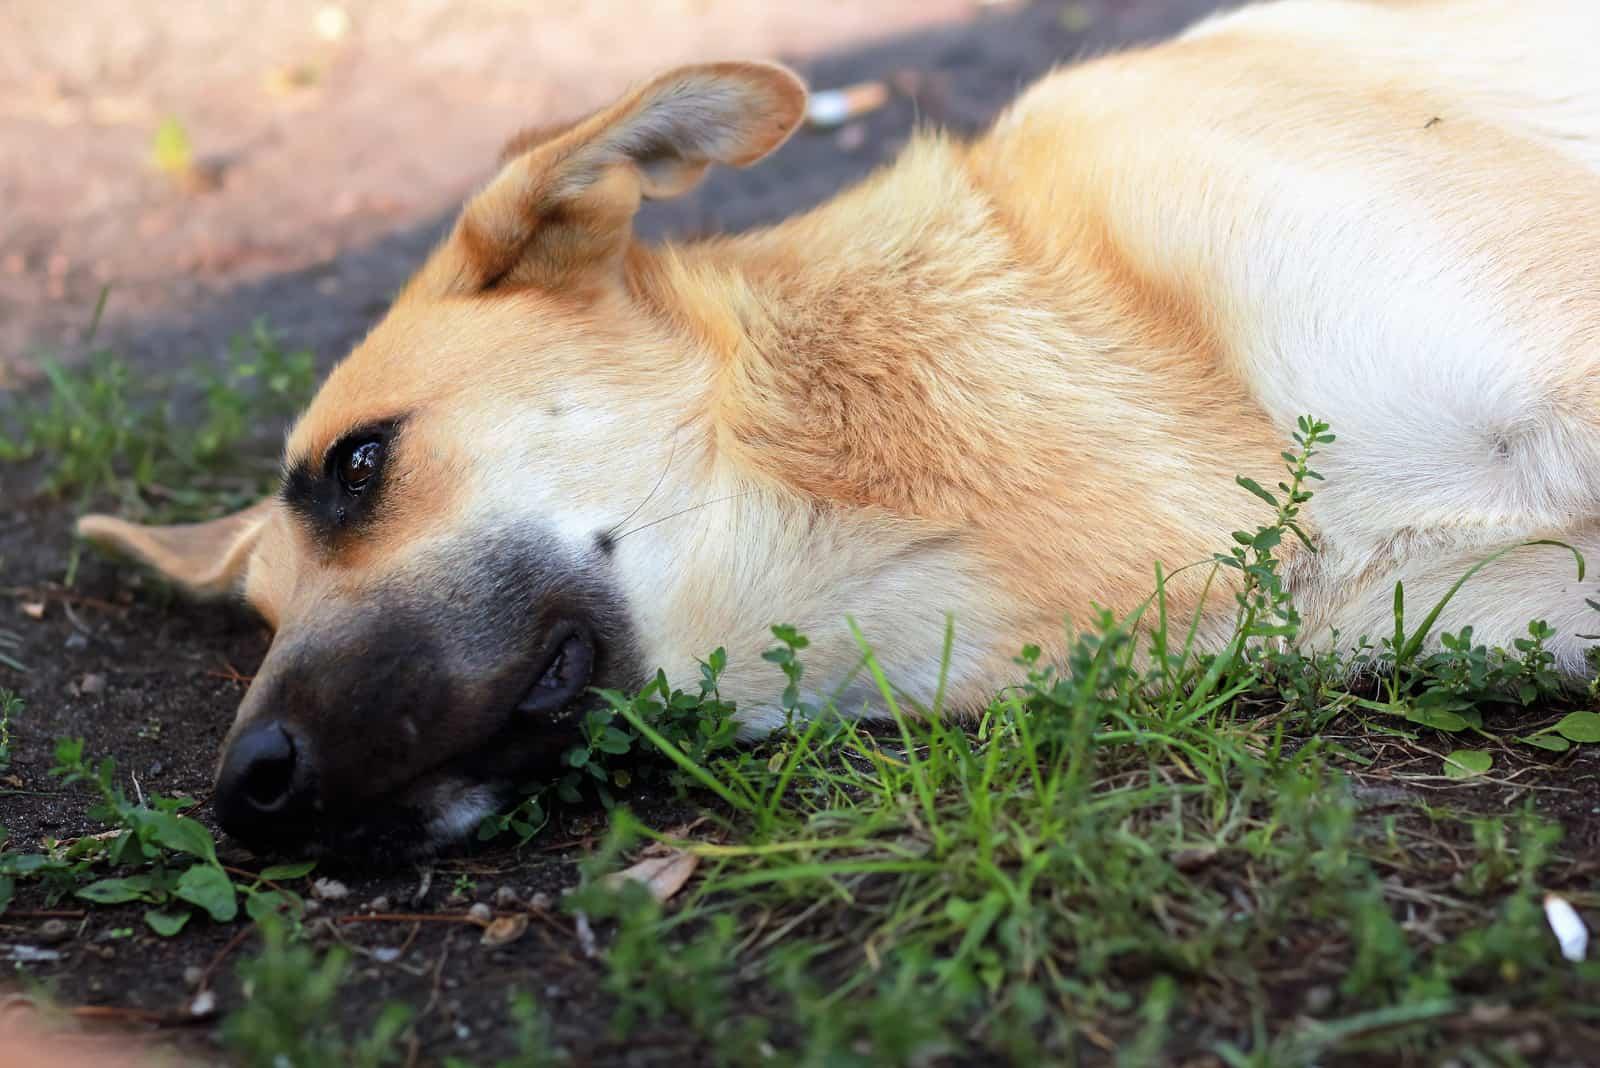 a sad dog lies on the ground